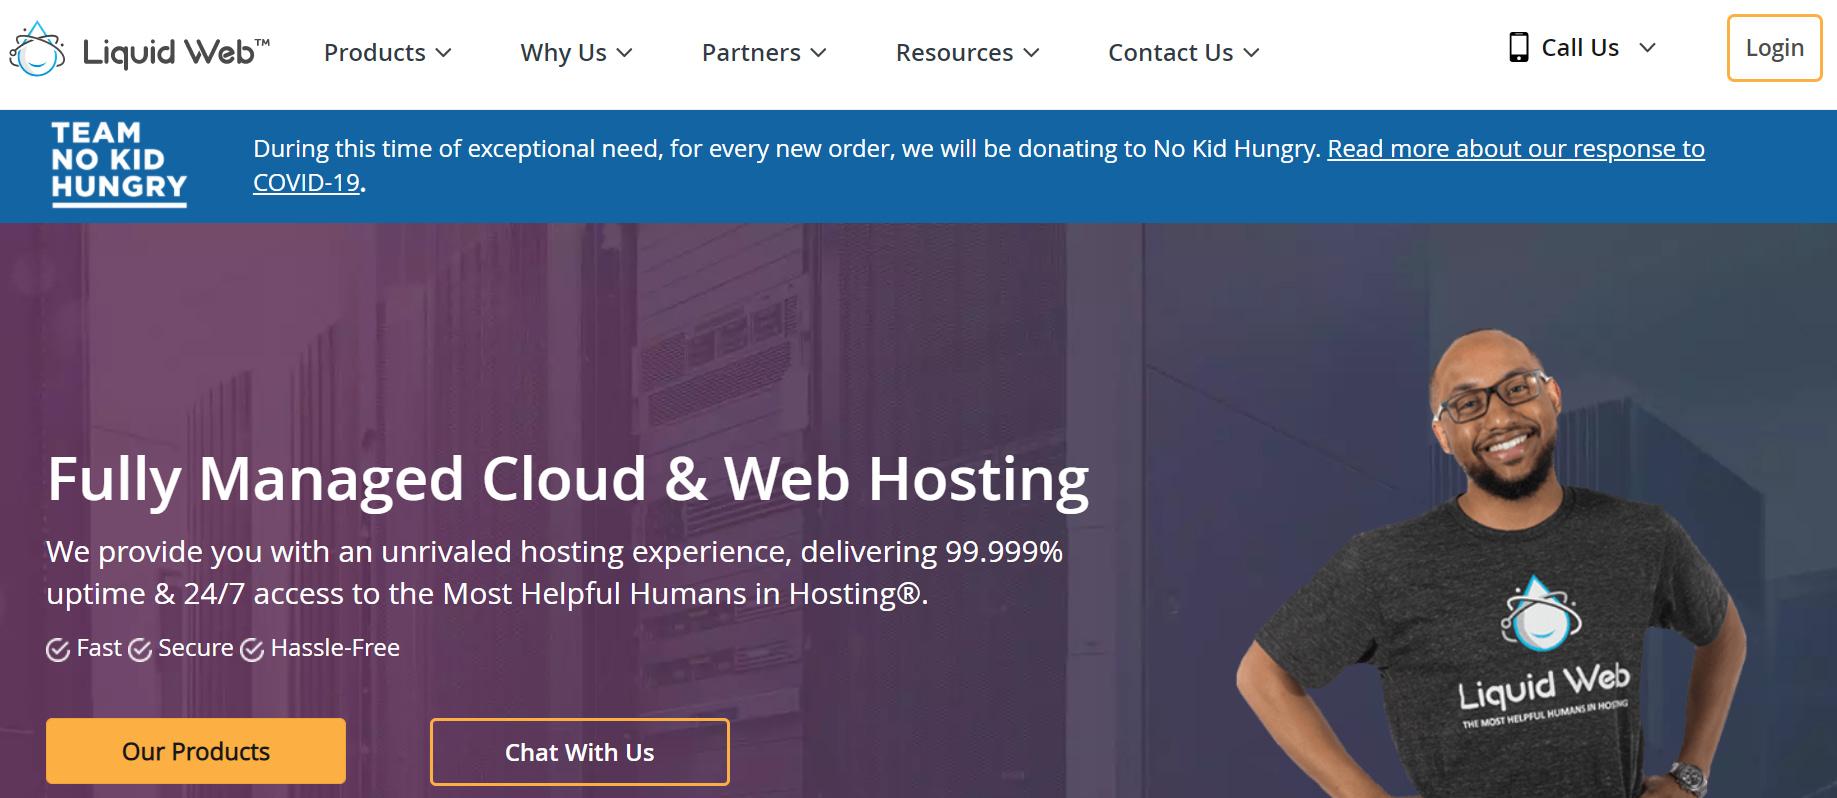 The Liquid Web homepage.